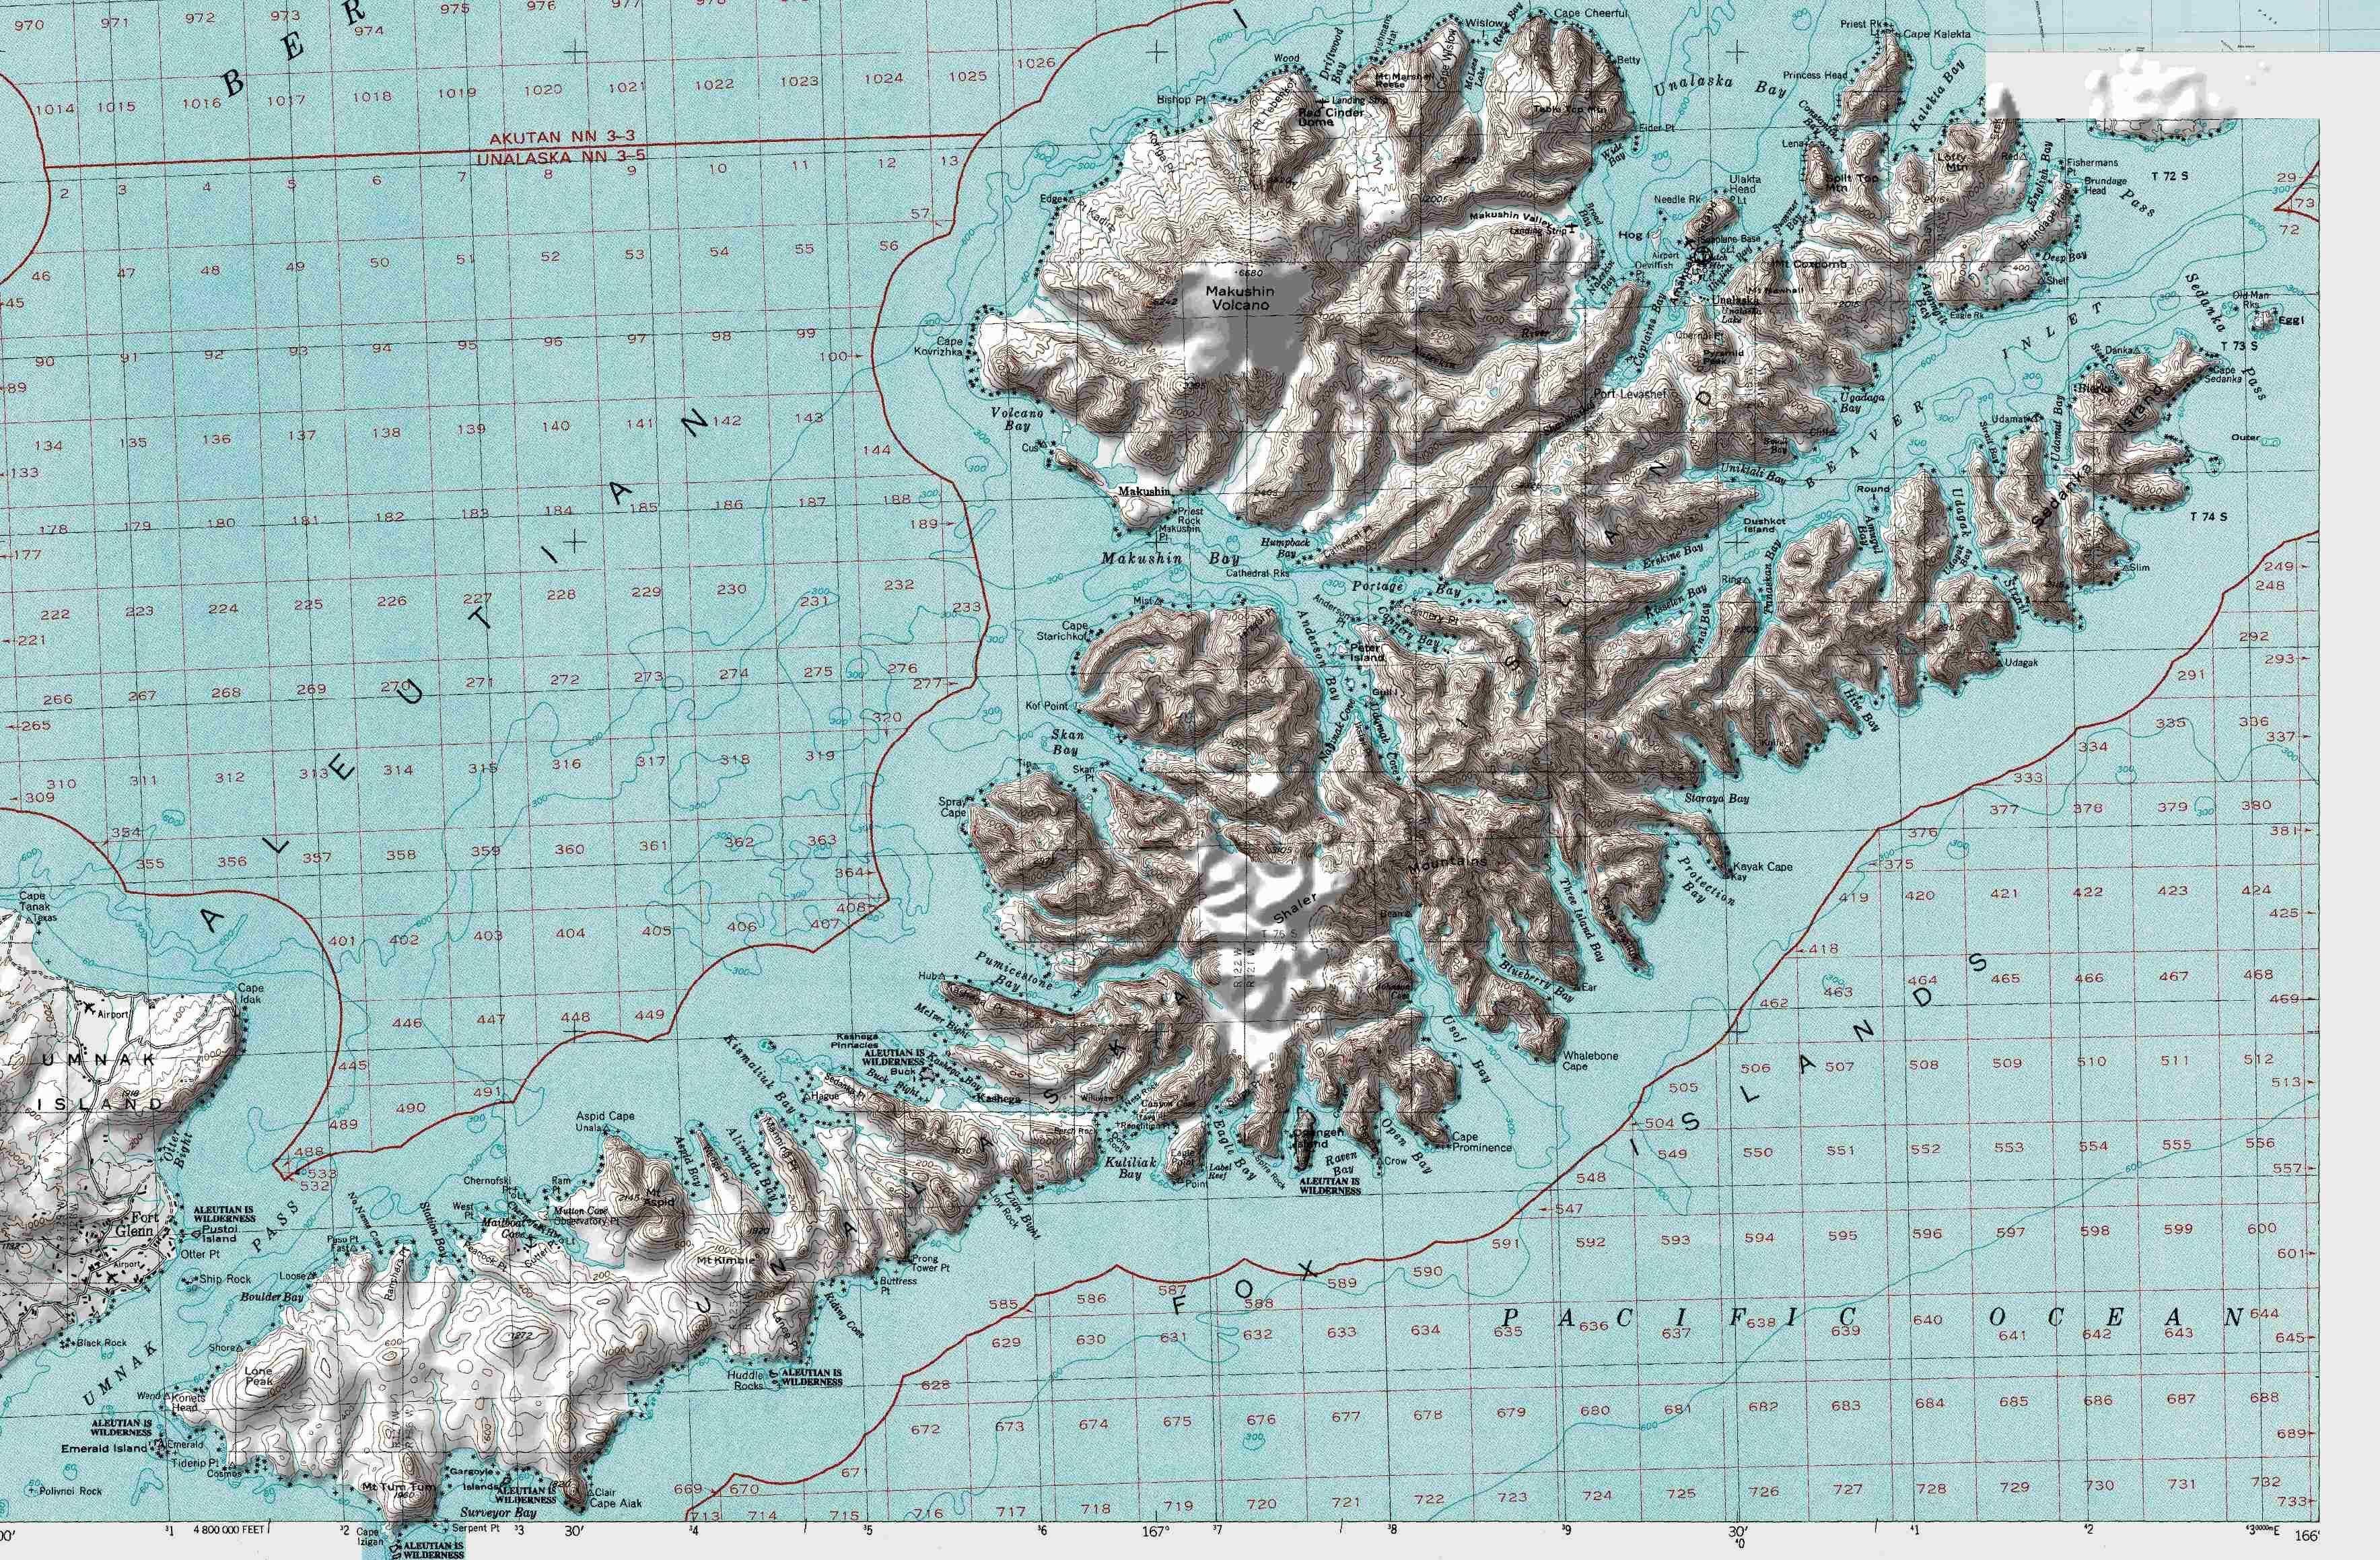 Map of Unalaska Island in the Aleutians